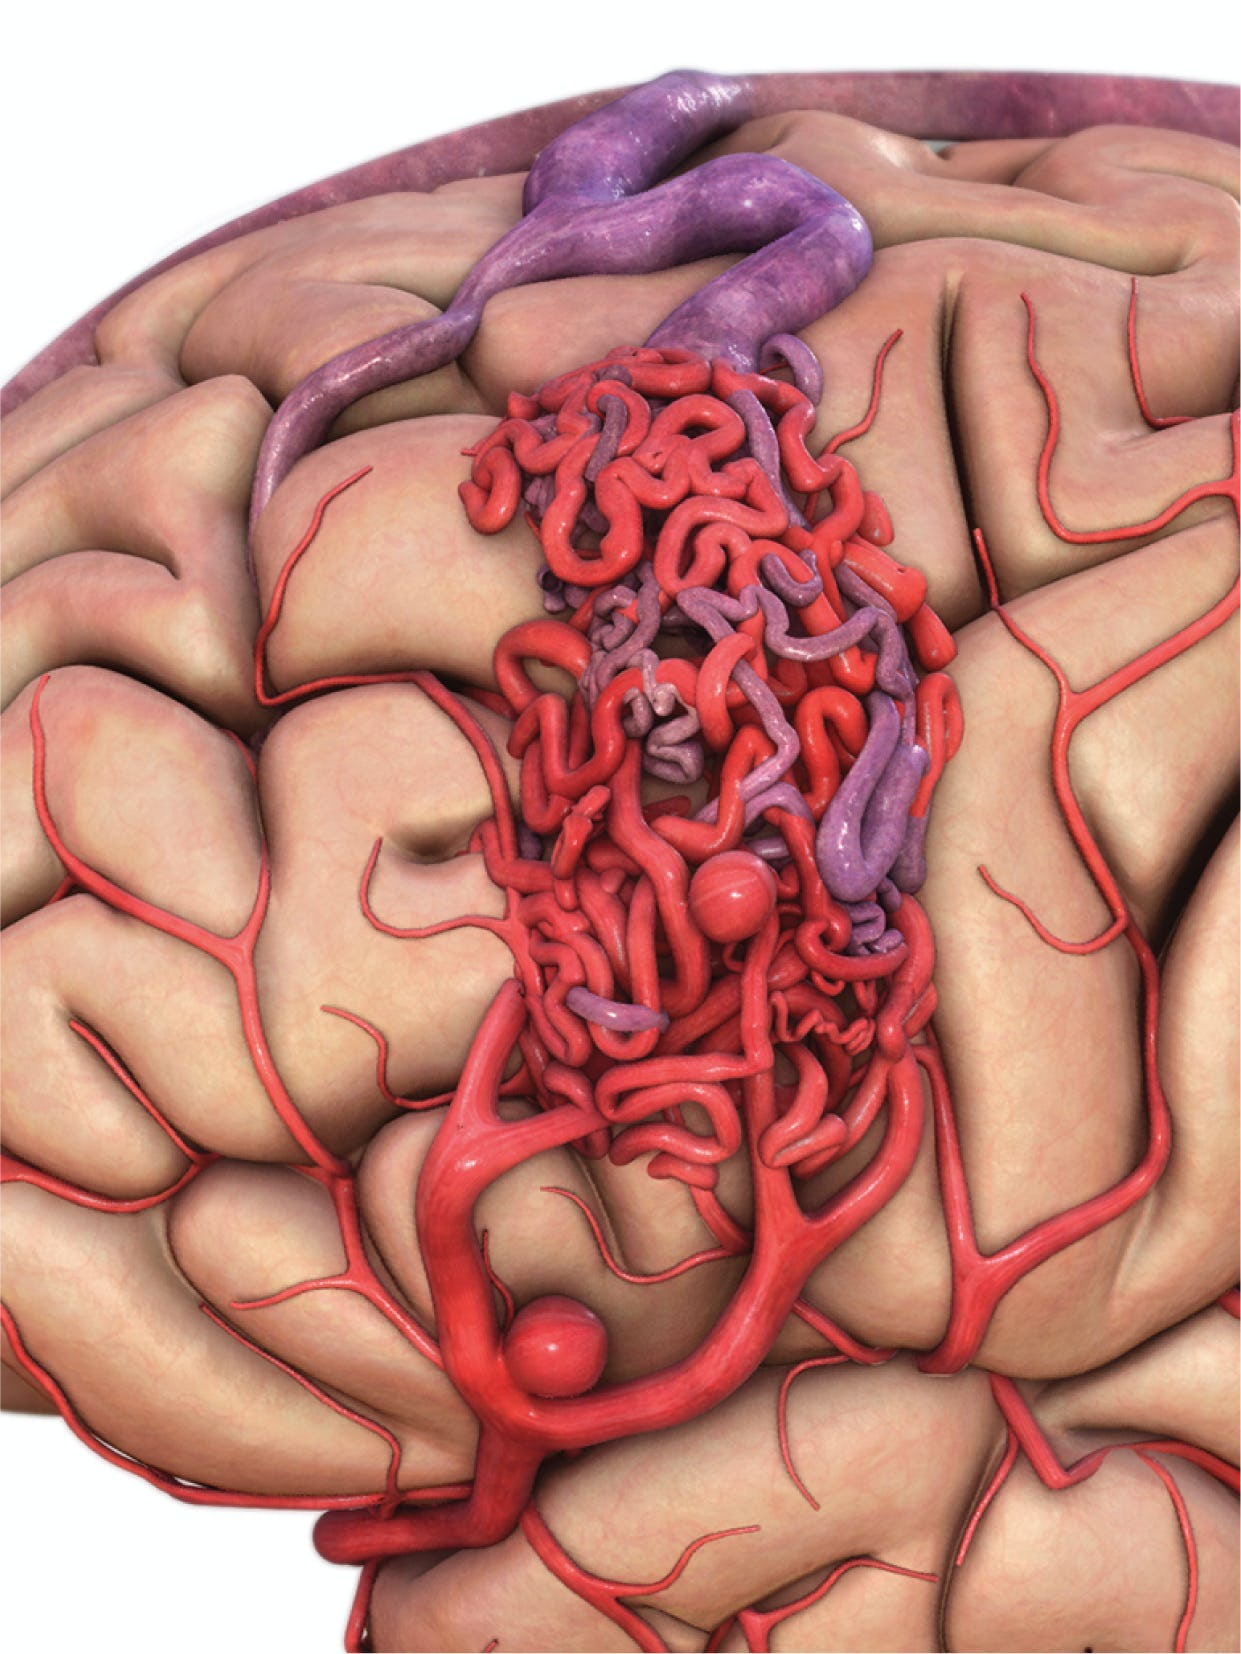 Malformații arterio-venoase cerebrale - cauze, simptome, tratament